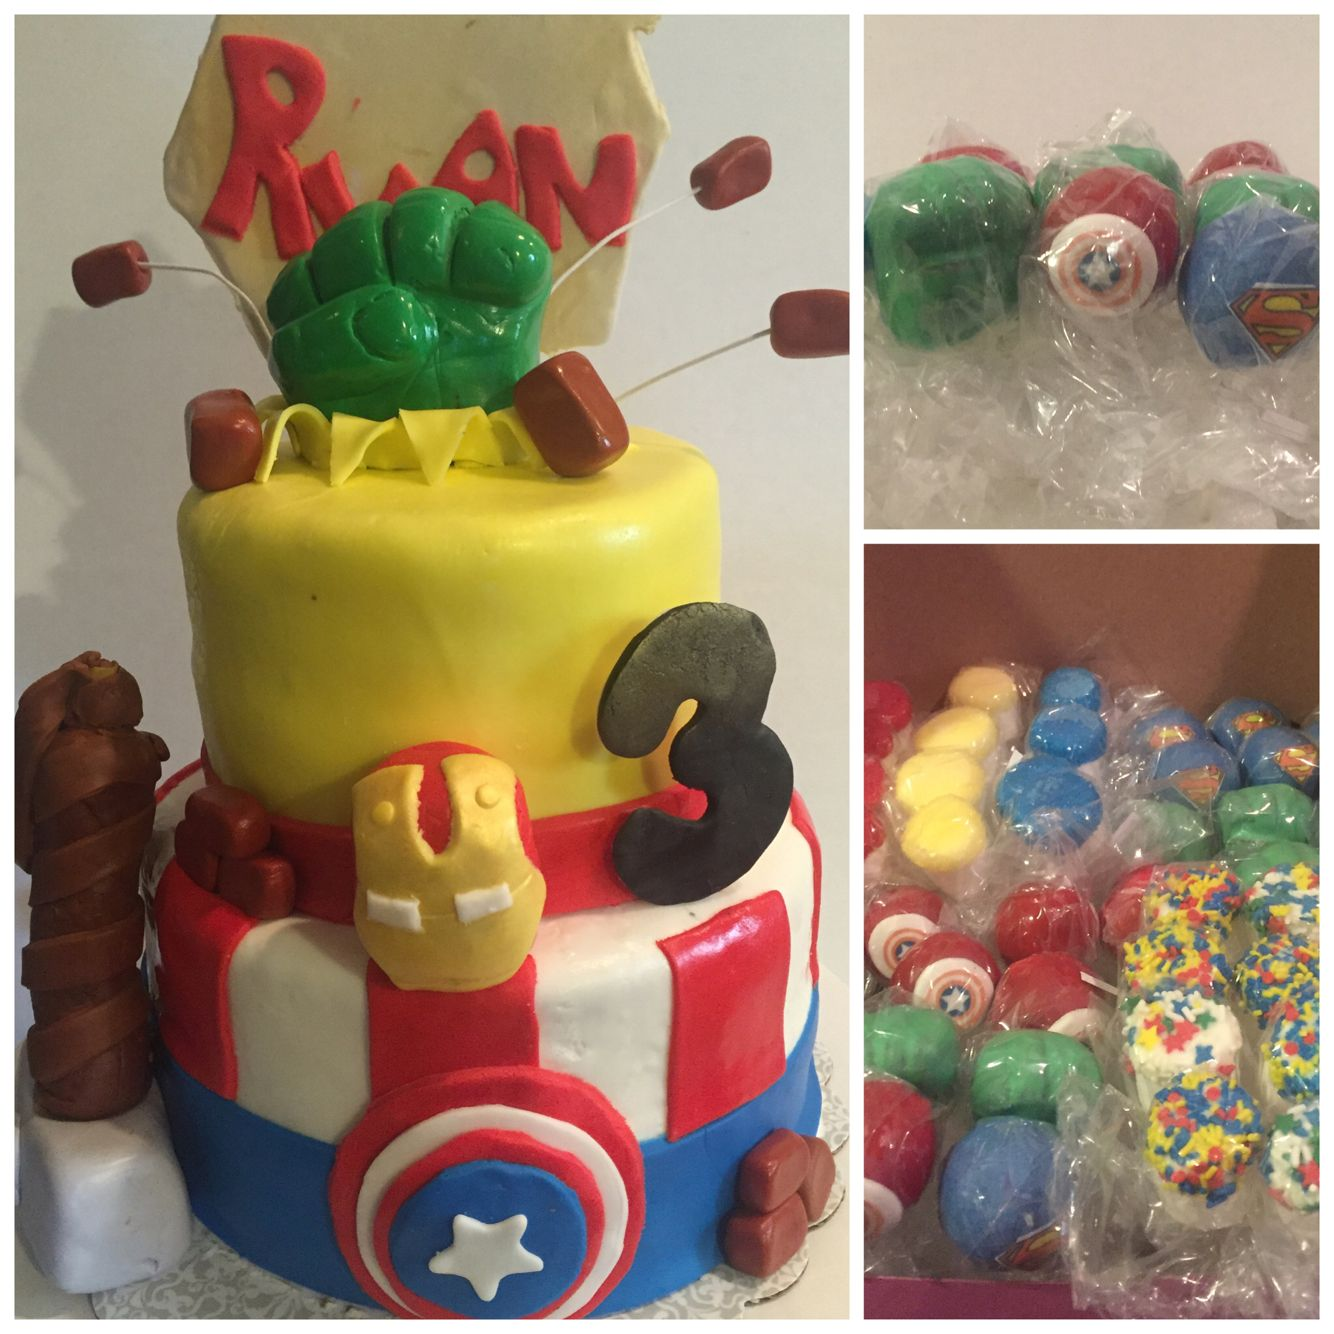 "Avengers party pack starts at $100 includes 8""/6"" cake, 1 dozen avenger Cakepops and 1 dozen rainbow sprinkled chocolate covered Marshmallow pops"